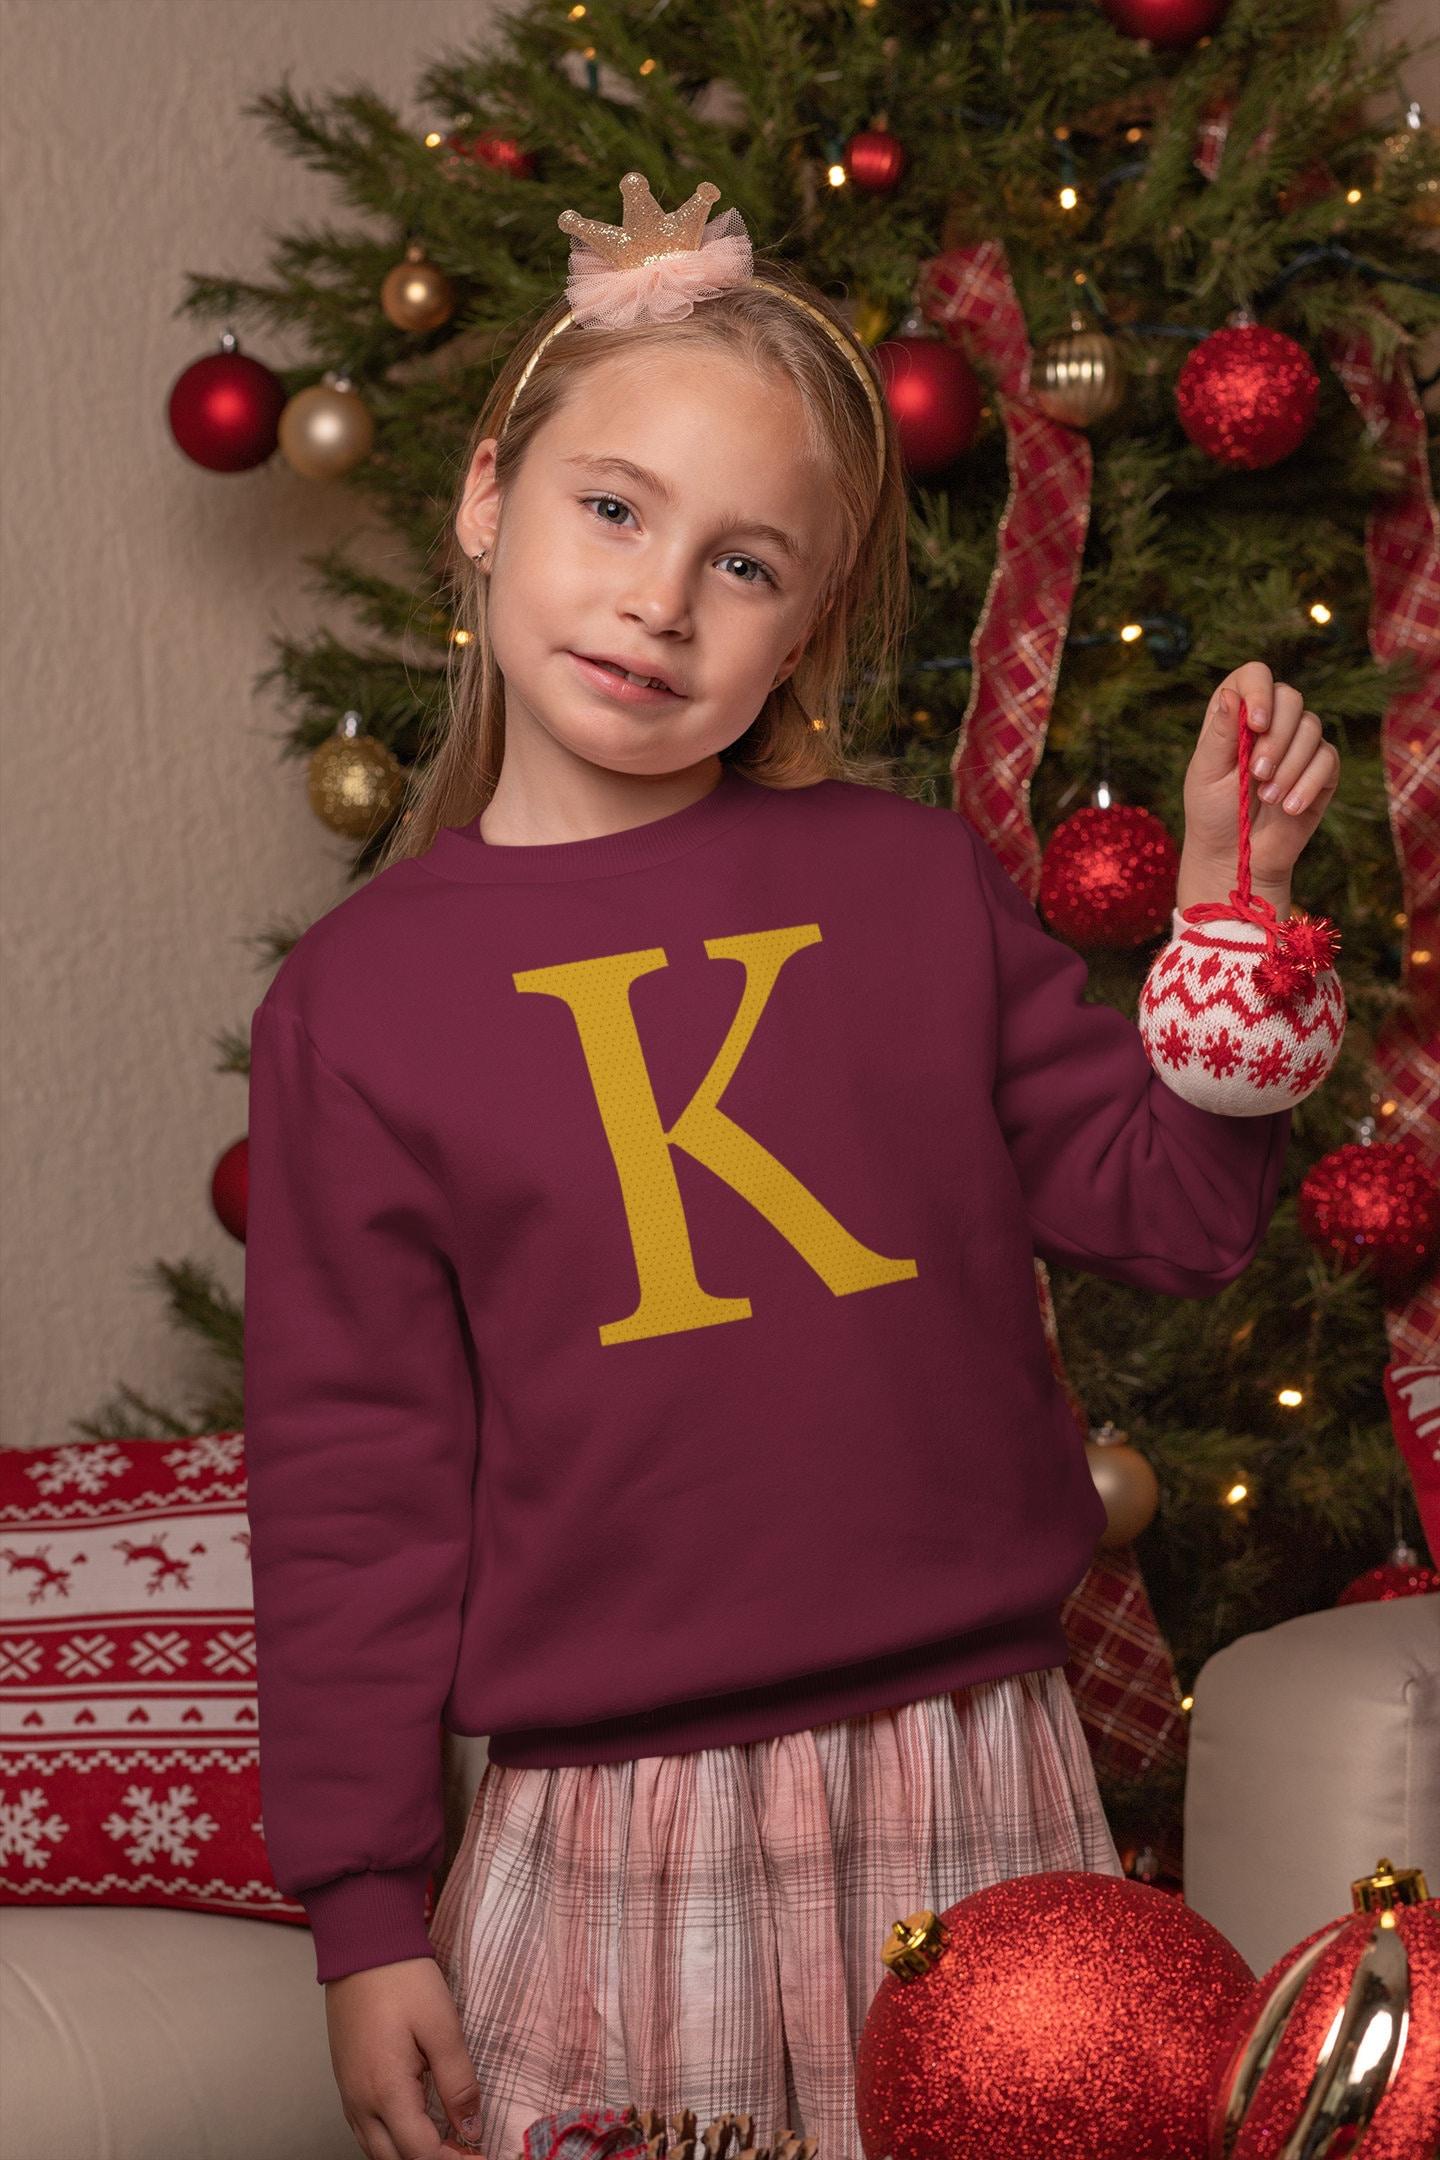 Harry Christmas Sweater Customized Weasley Sweatshirt Weasley Hoodie For Youth Weasley Sweater For Youth Weasley Jumper